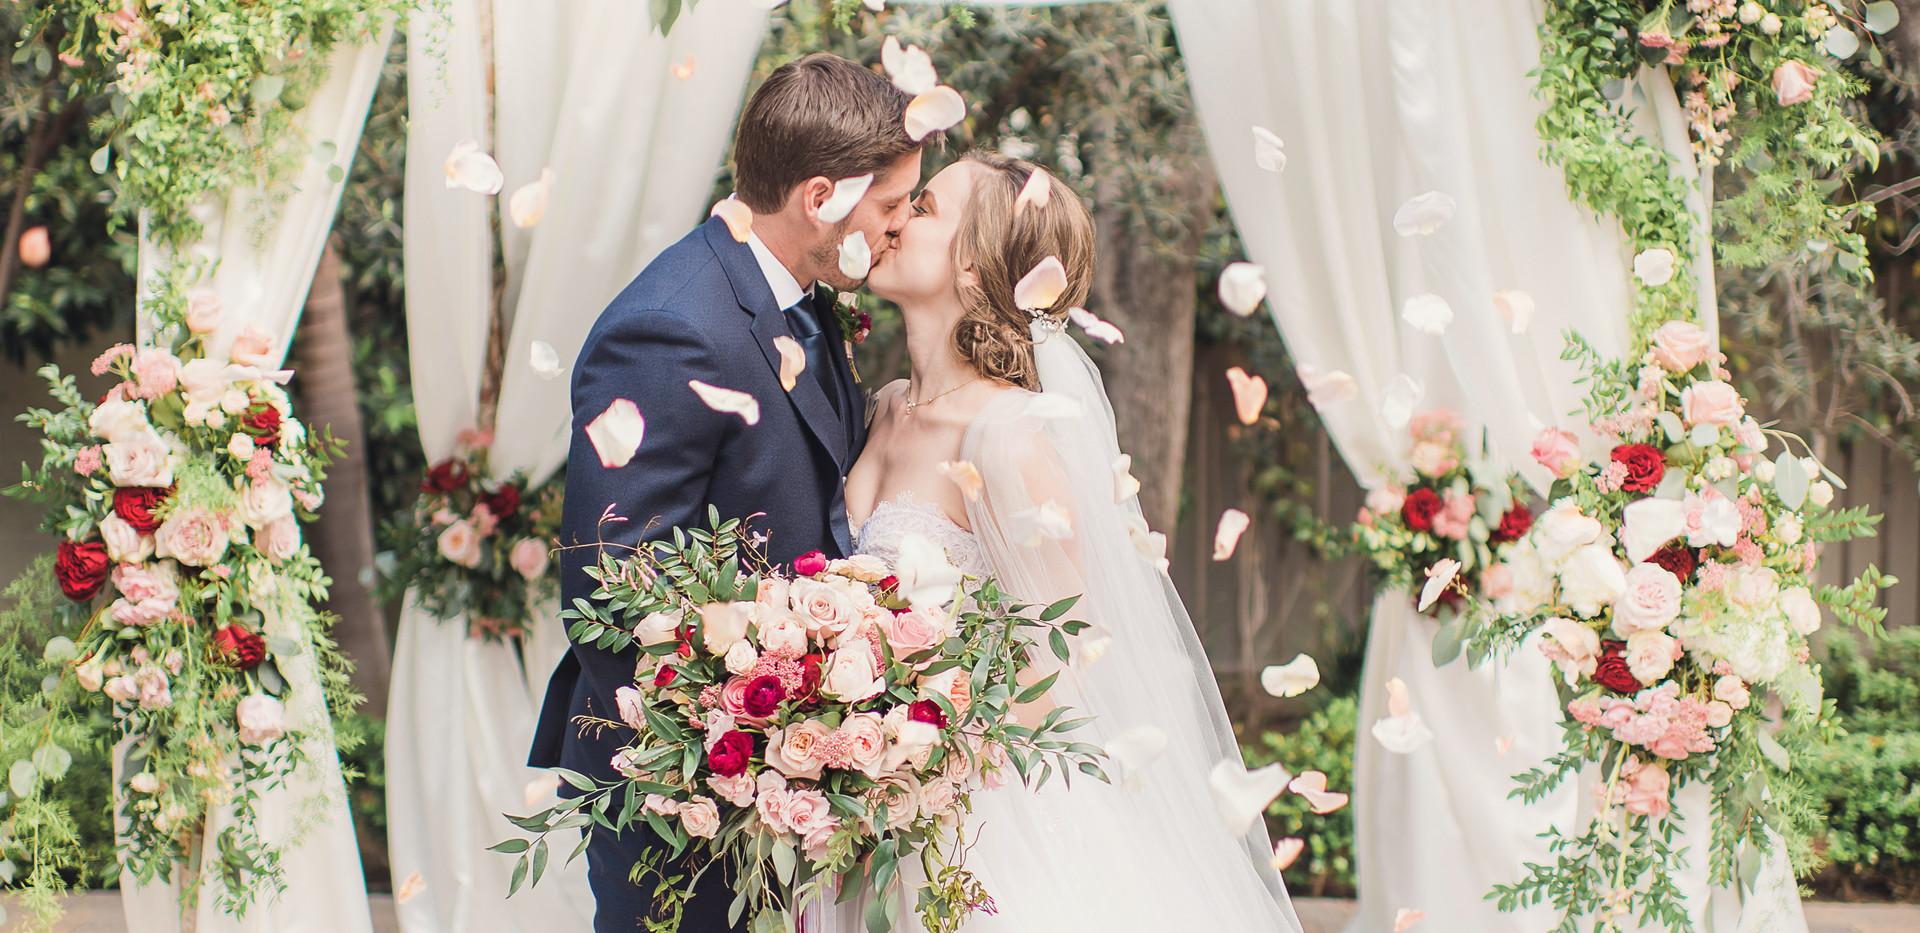 Blush, Red, and White Vibiana Wedding Kiss